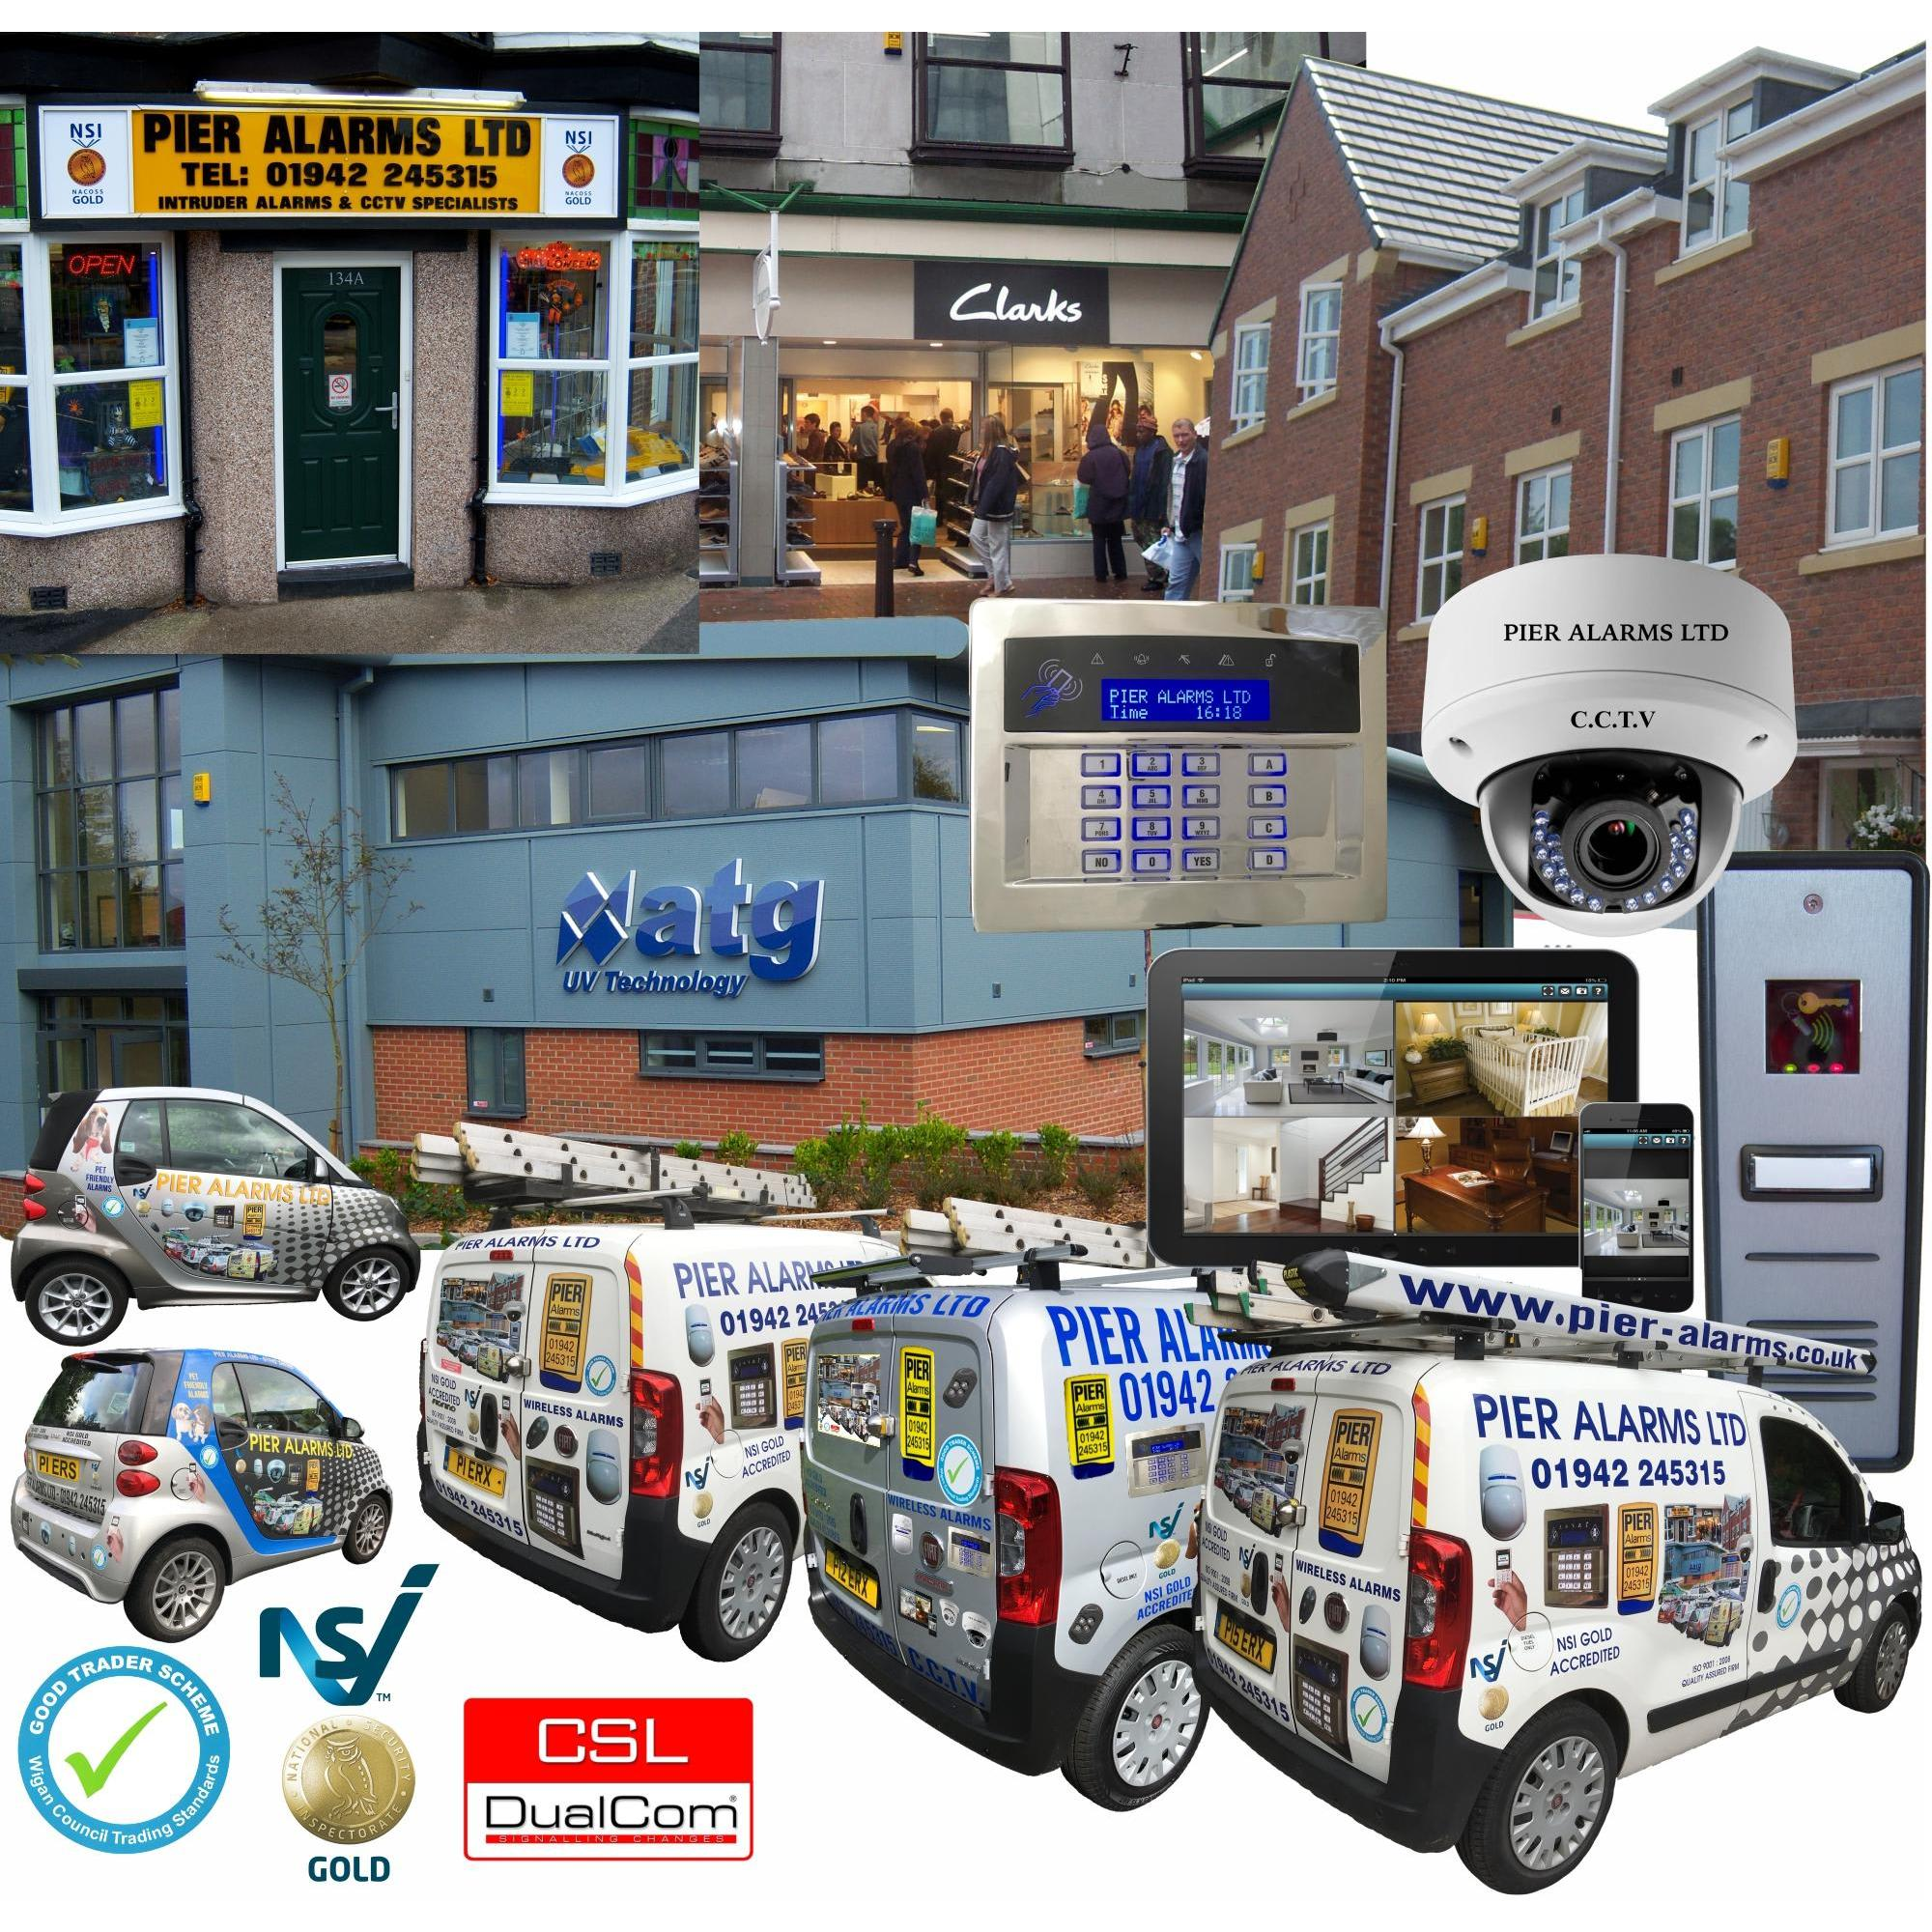 Pier Alarms - Wigan, Lancashire WN1 2LA - 01942 245315 | ShowMeLocal.com